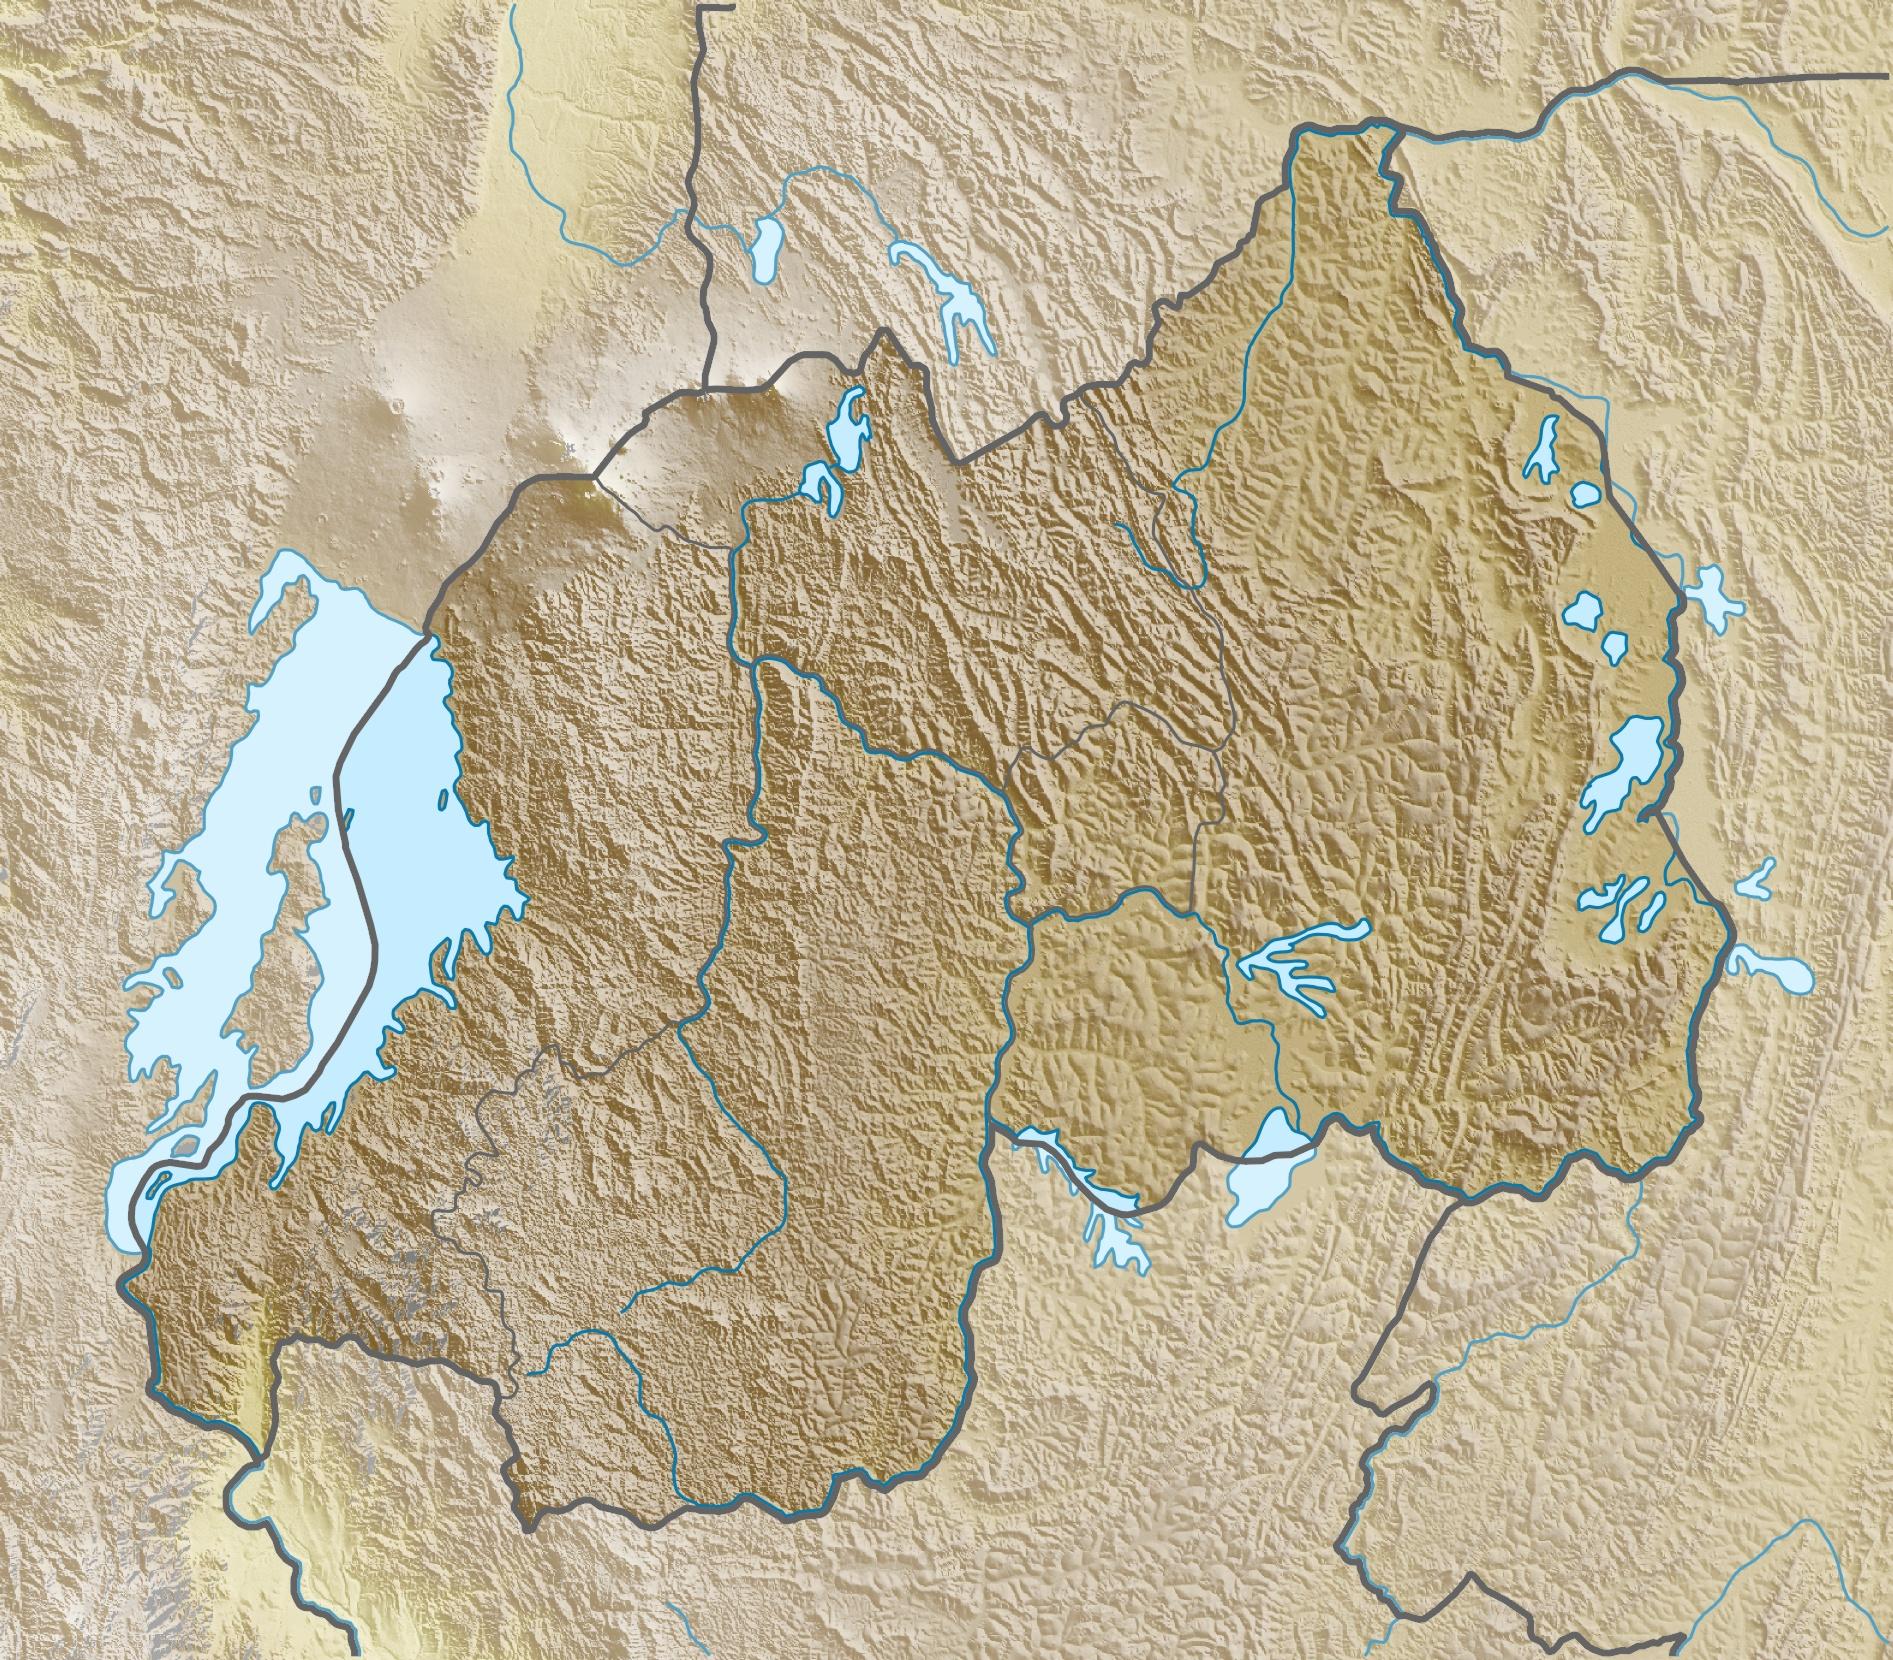 FileRwanda relief location mapjpg Wikimedia Commons